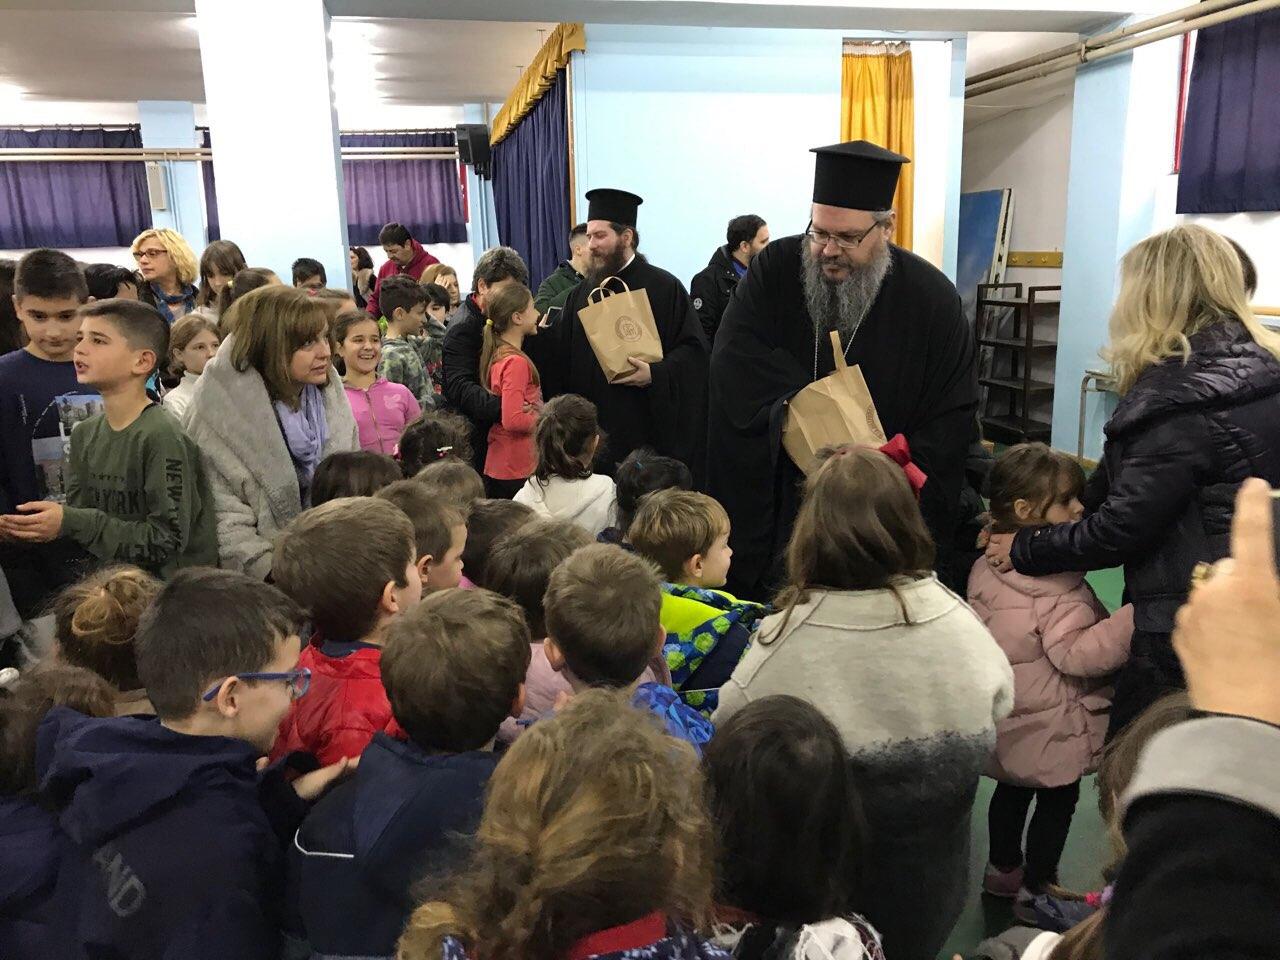 sxolia tirnavos 2 - Σε σχολεία του Τυρνάβου ο Σεβασμιώτατος (φωτ.)